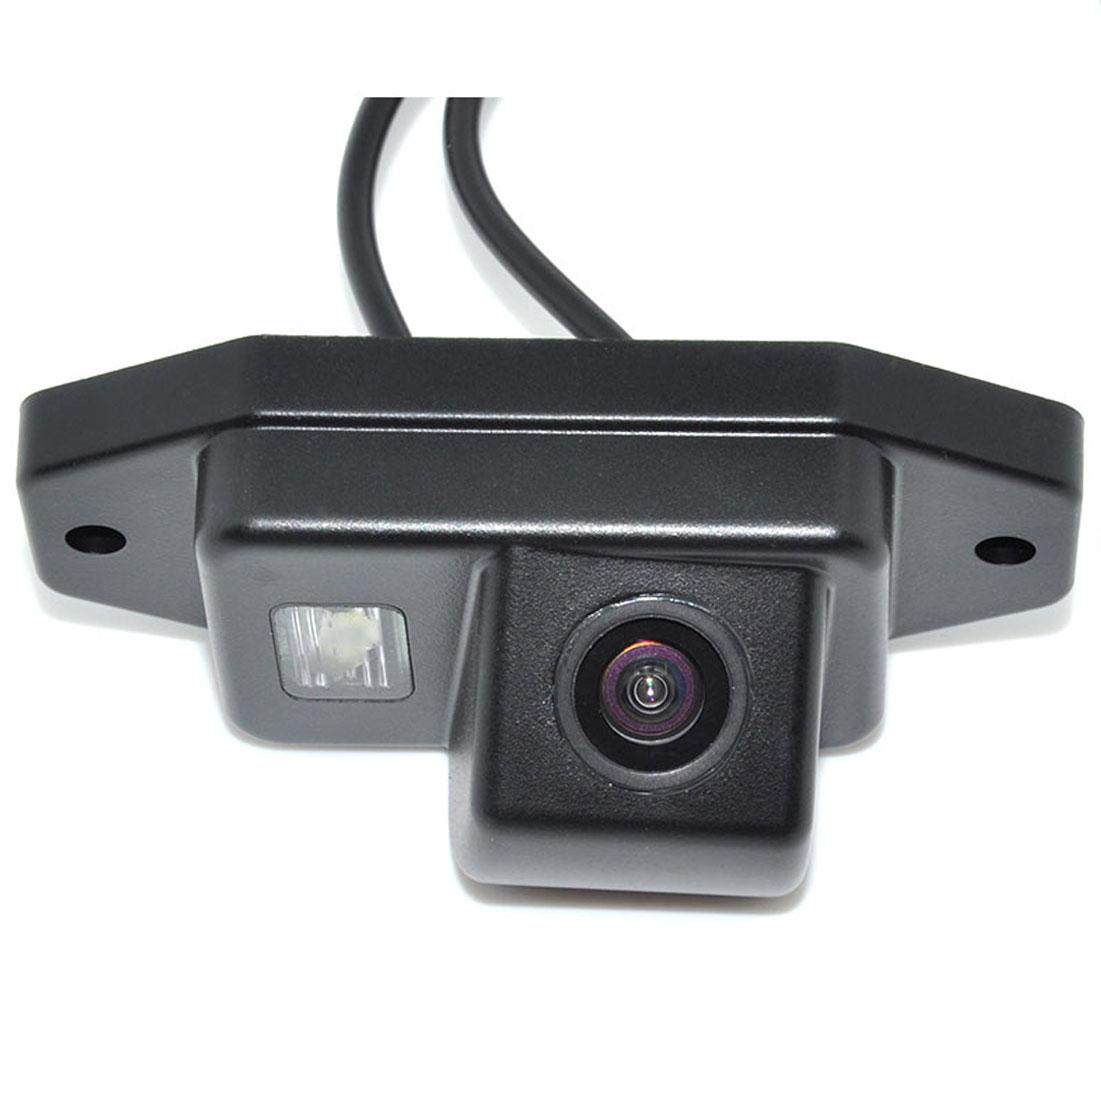 HD CCD Car rear view camera backup camera for 2002-2009 Toyota Land Cruiser 120 Series Toyota Prado 2700 4000